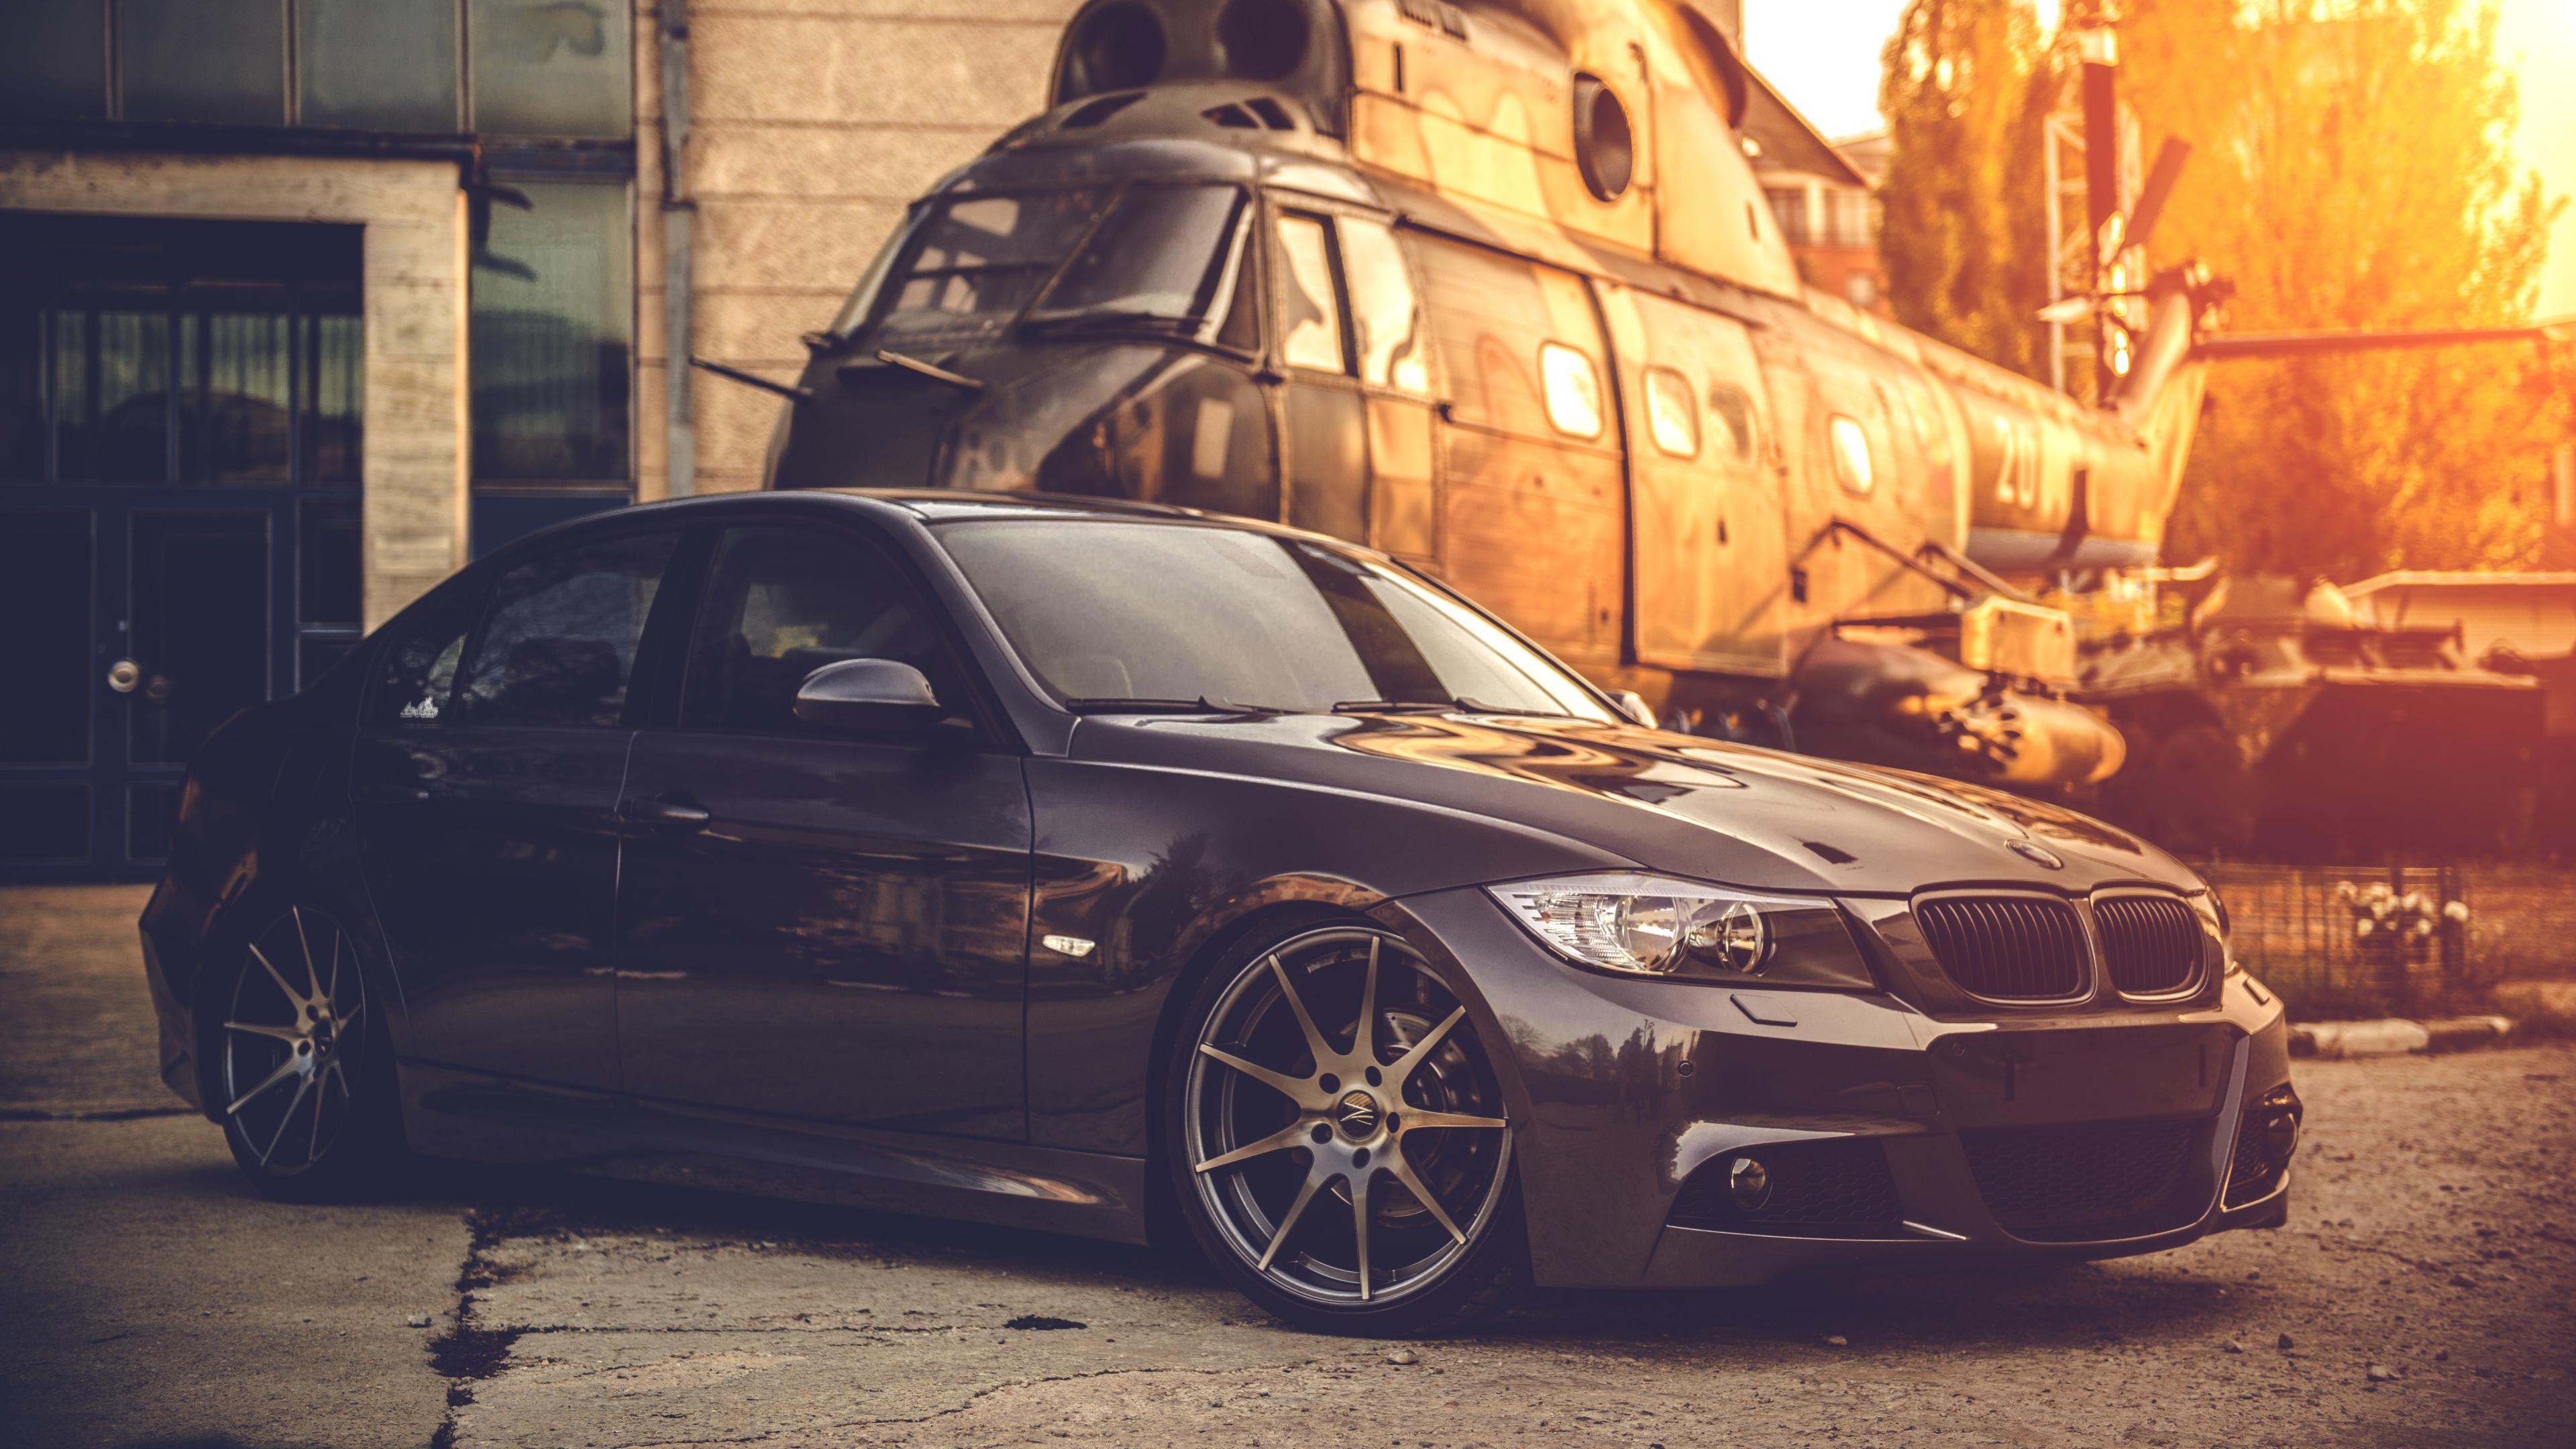 BMW Car Black 4K ULTRA HD Wallpaper I HD Images 3840x2160